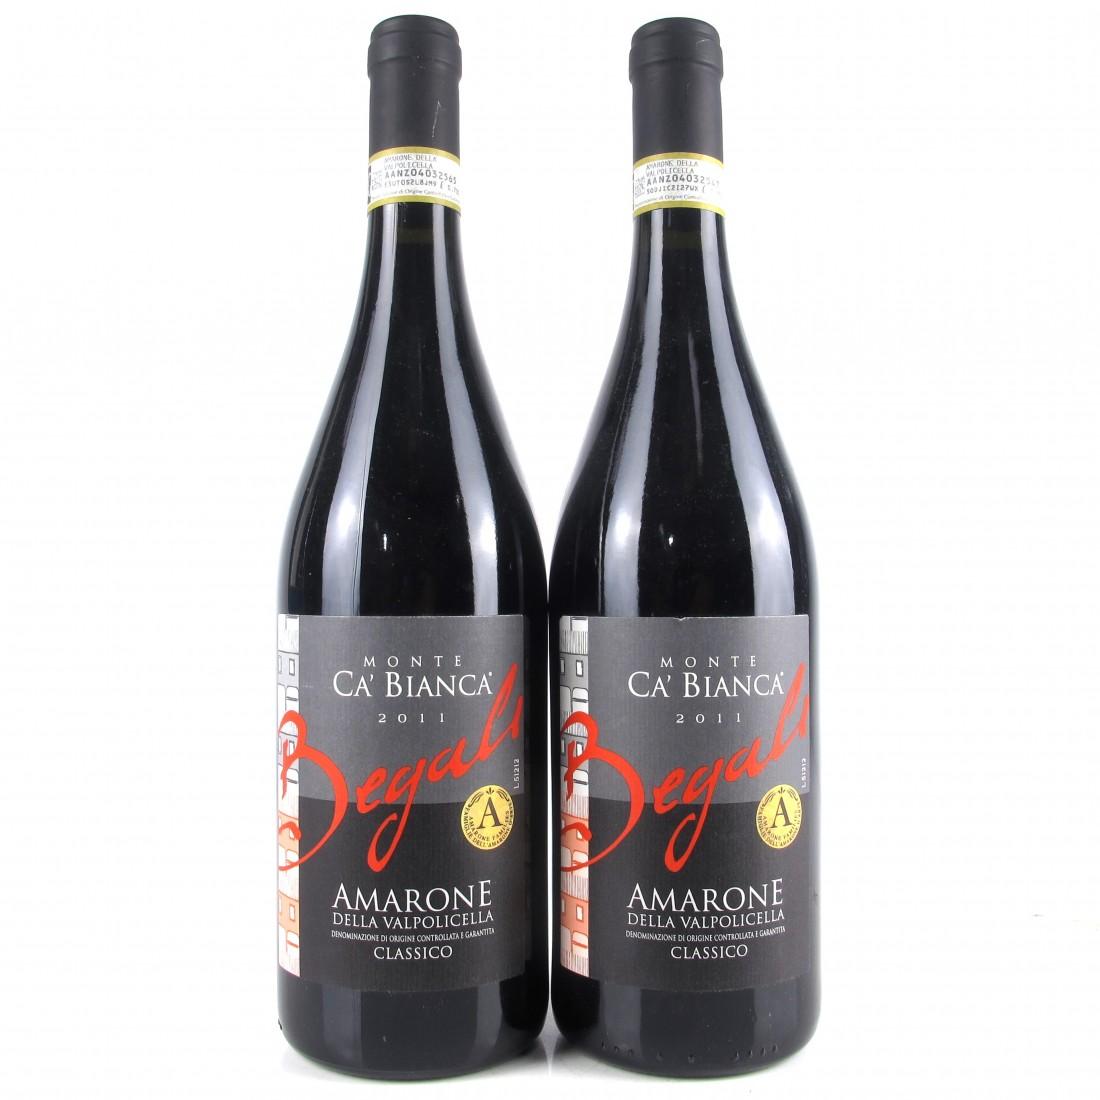 Begali 2011 Amarone 2x75cl